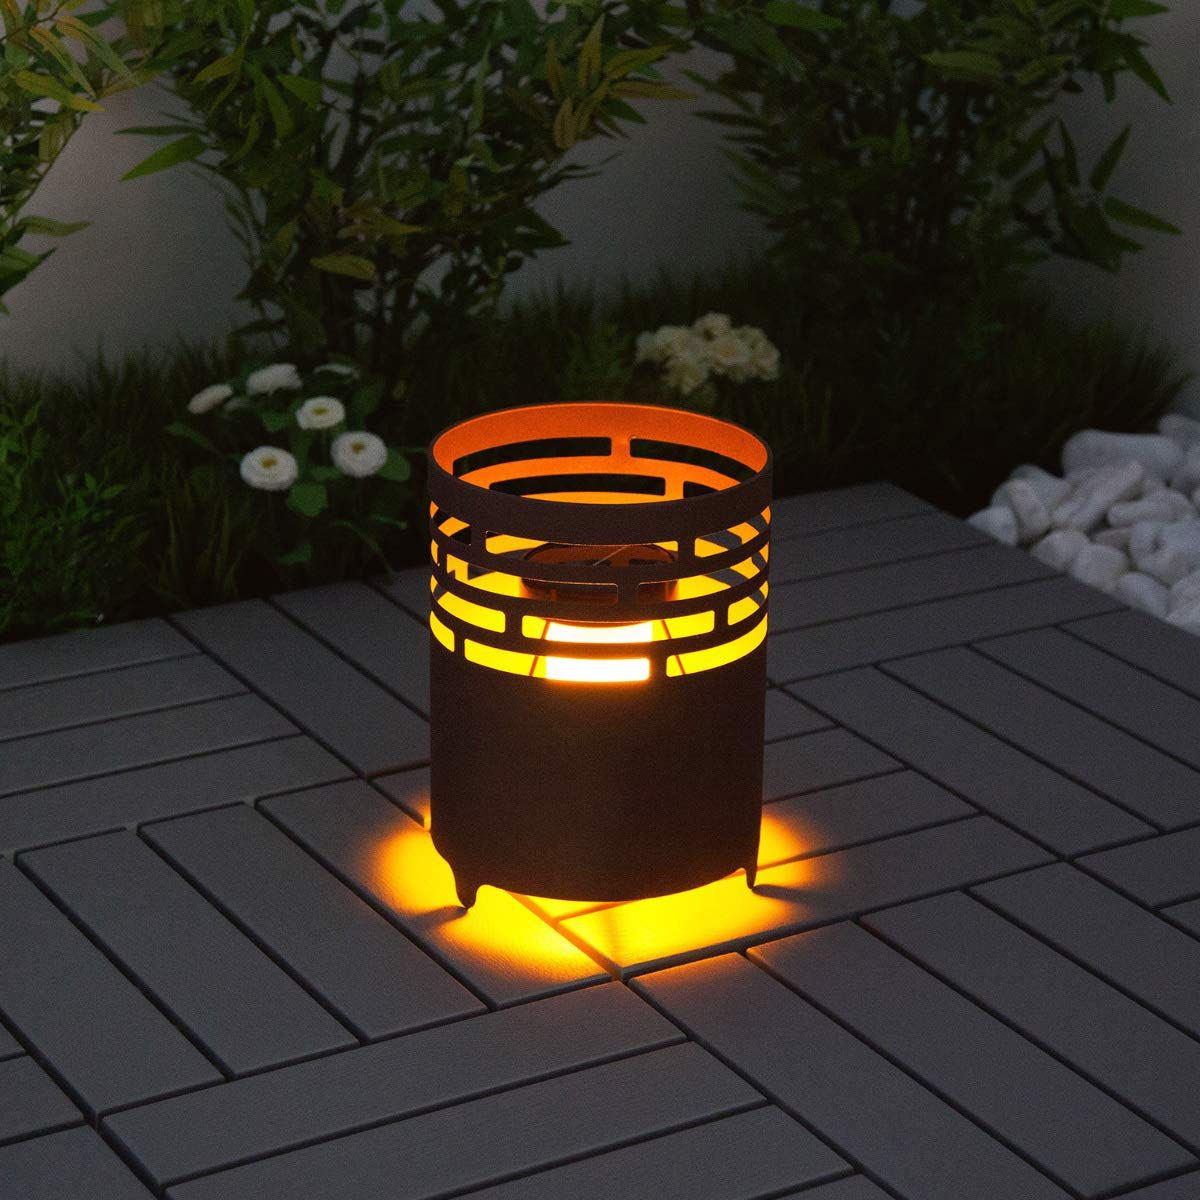 Led Solar Feuerstelle Pavillon Beleuchtung Gartenbeleuchtung Feuerstelle